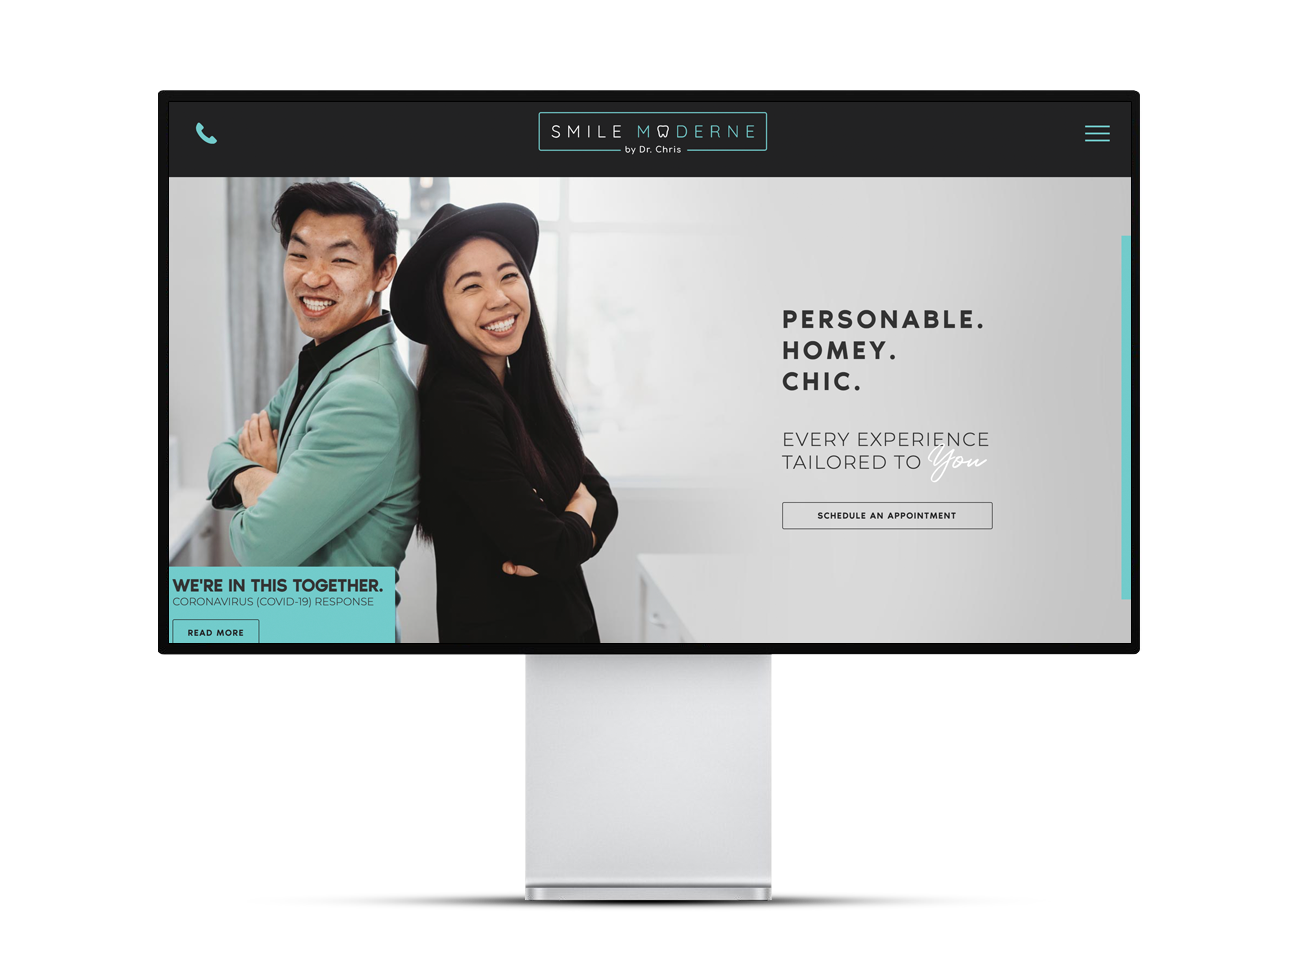 Screenshot of the Smile Moderne homepage